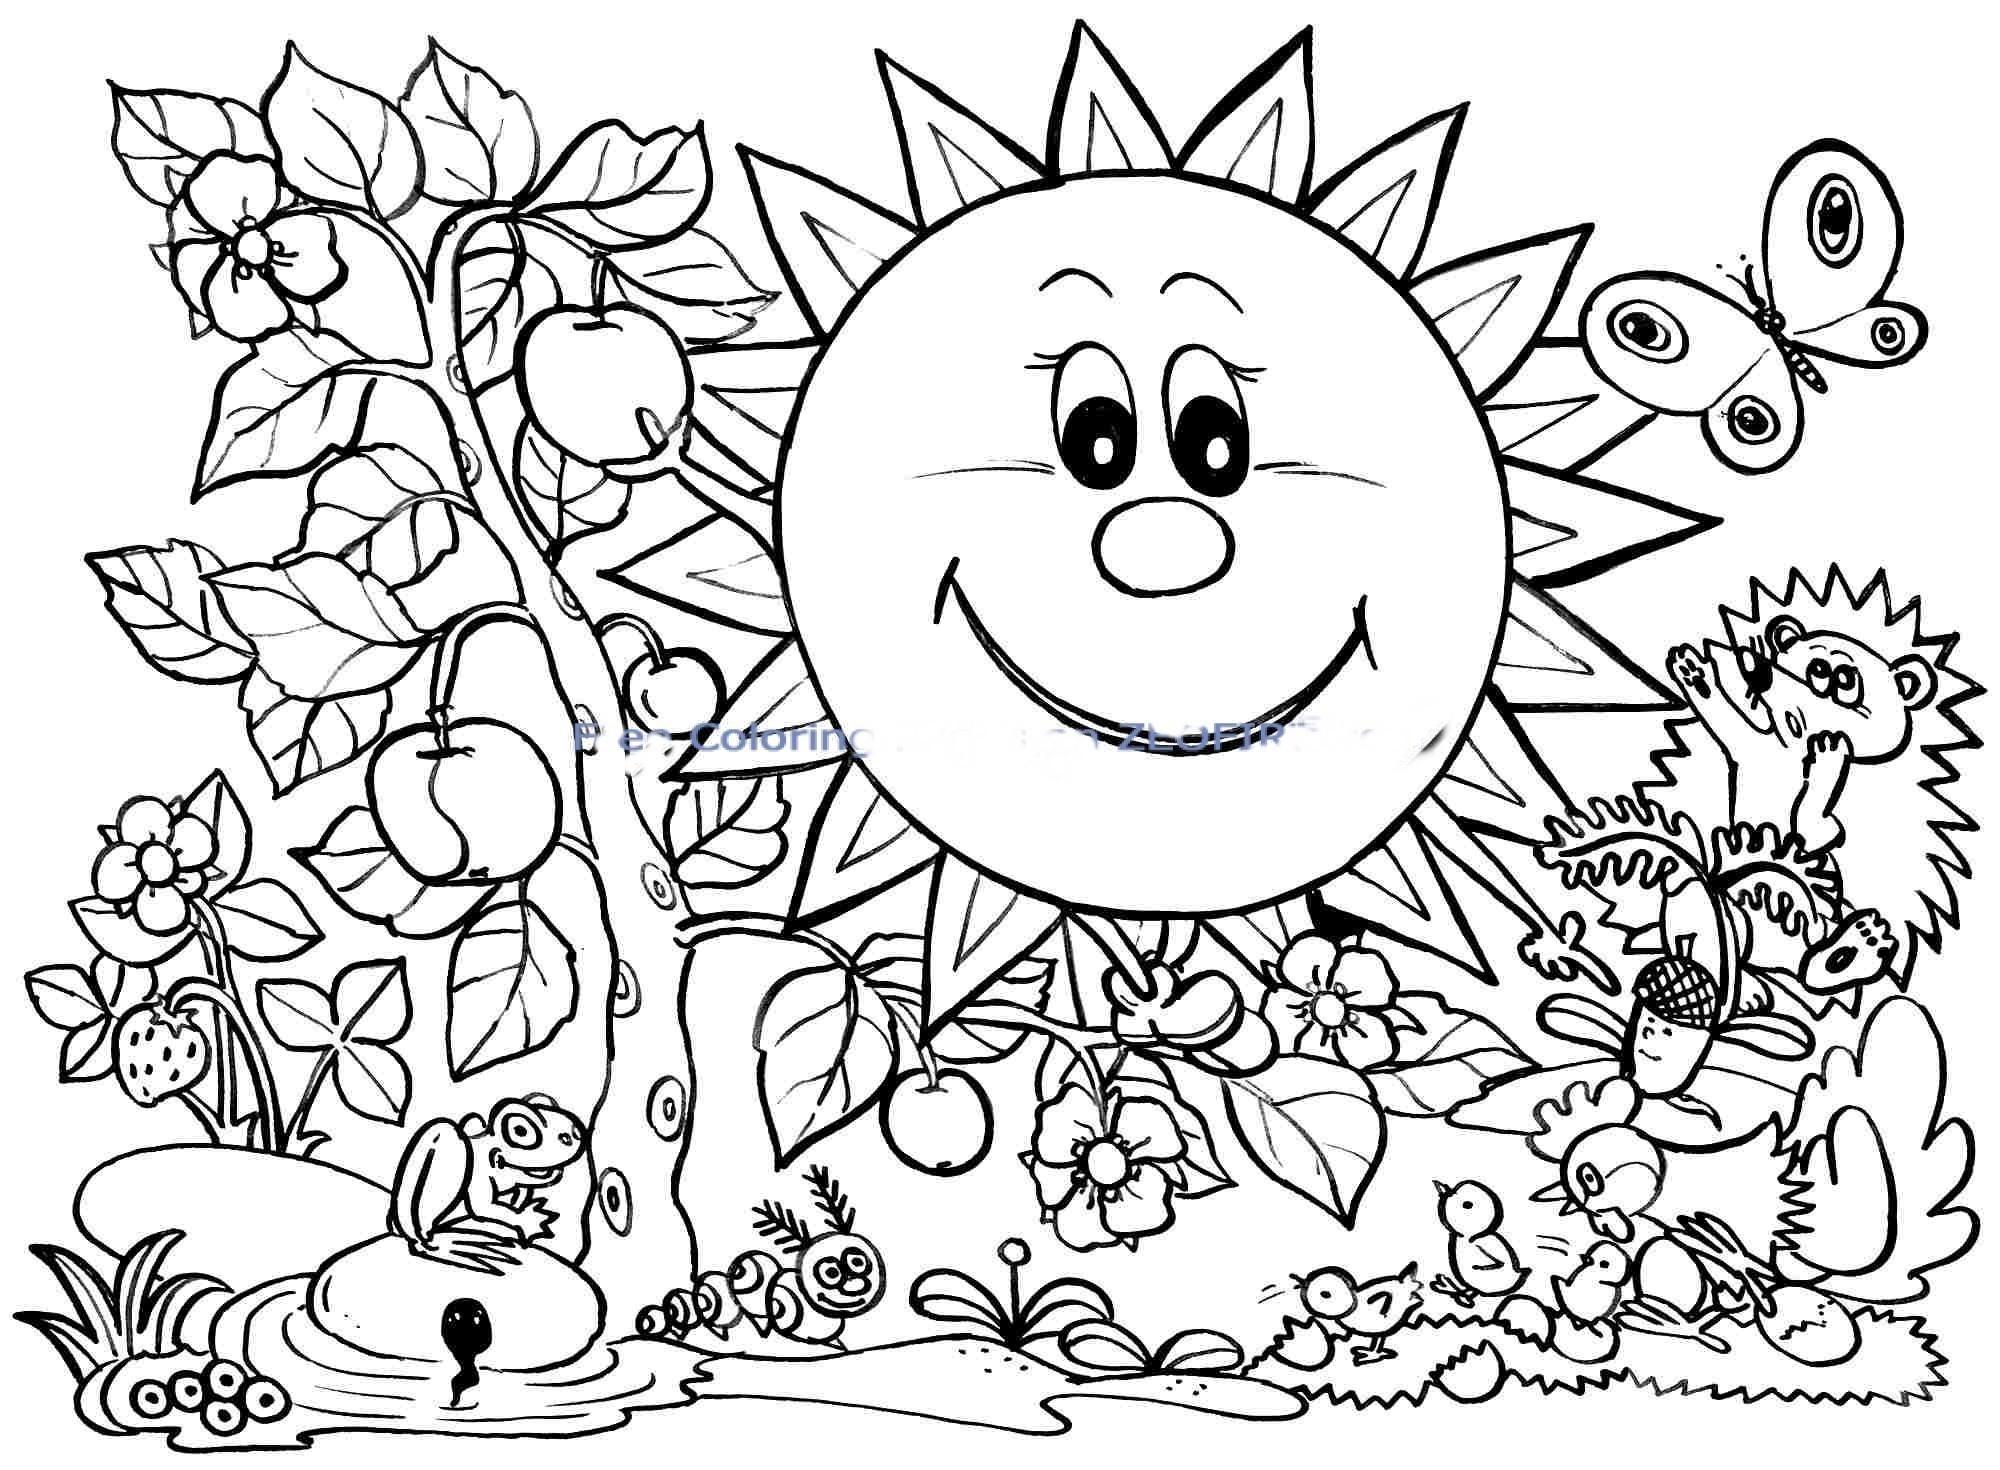 Coloring Pages Spring Spring Coloring Pages For Kids Coloring Page Hangenix Coloring